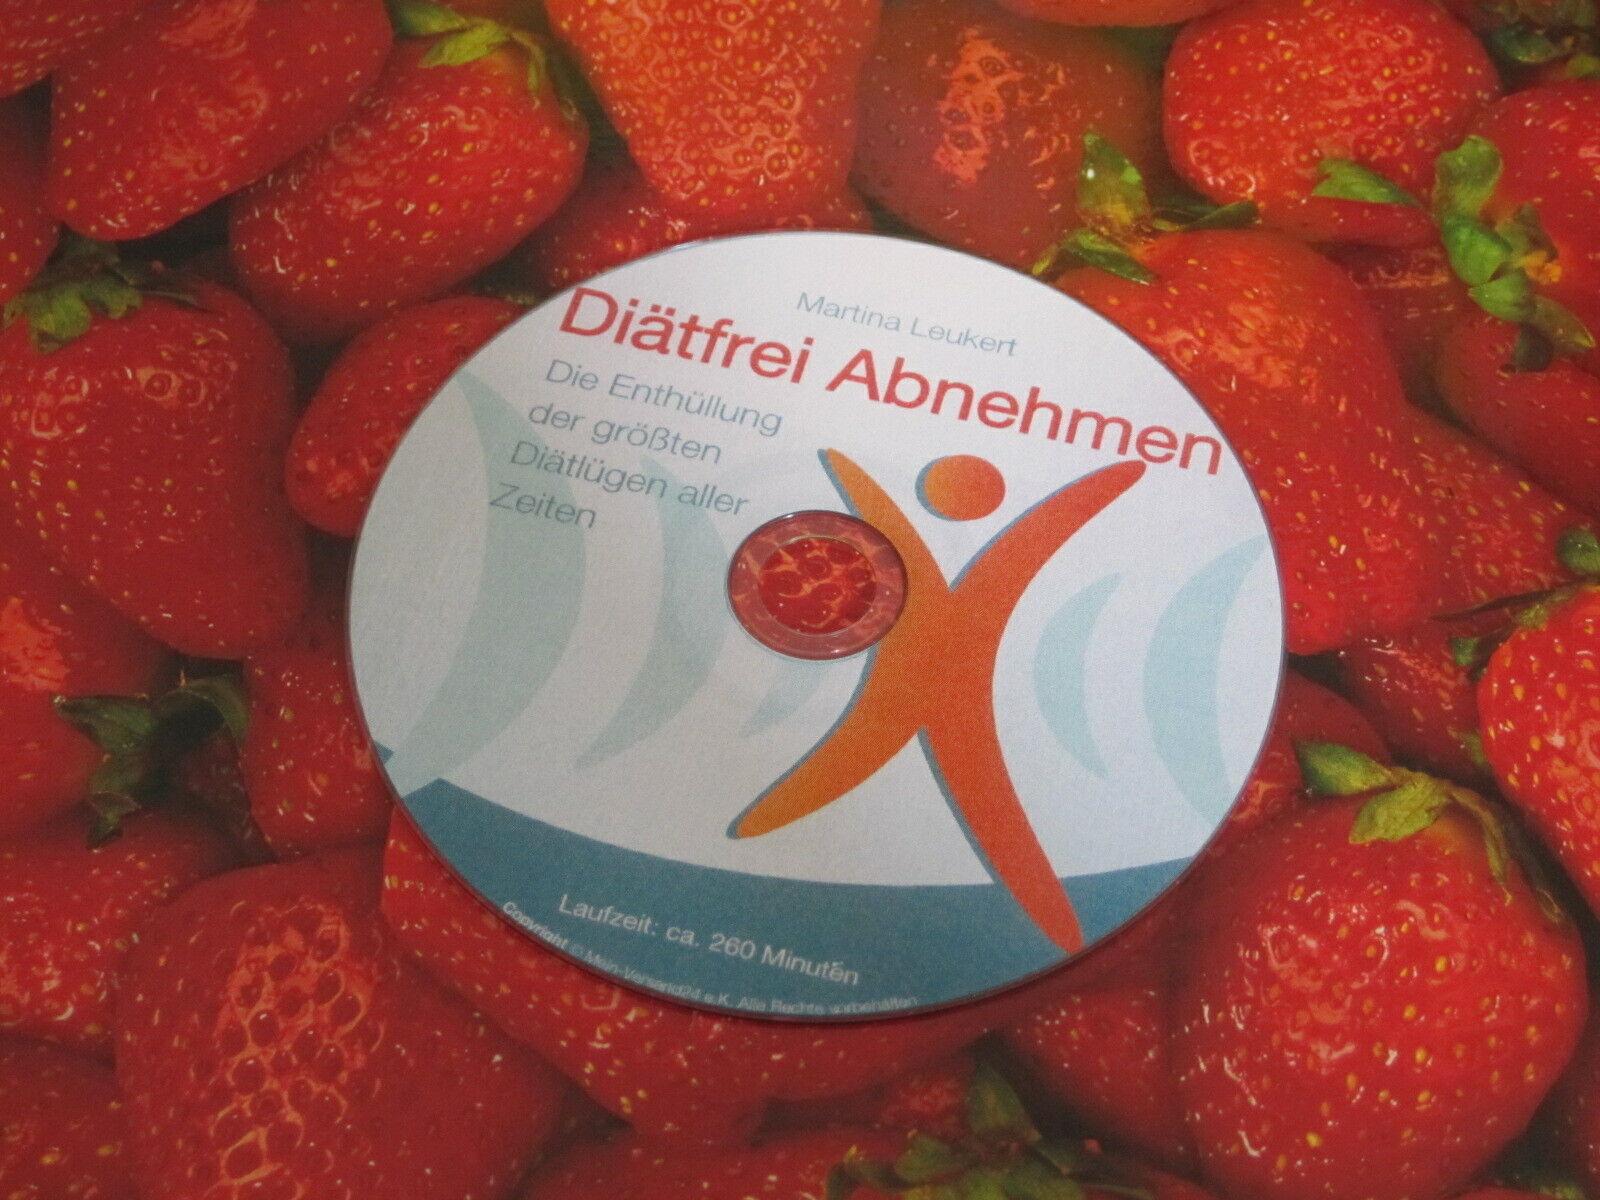 Diätfrei Abnehmen Ratgeber Dokumentation Hörbuch Motivation 5 Minuten Schlank CD